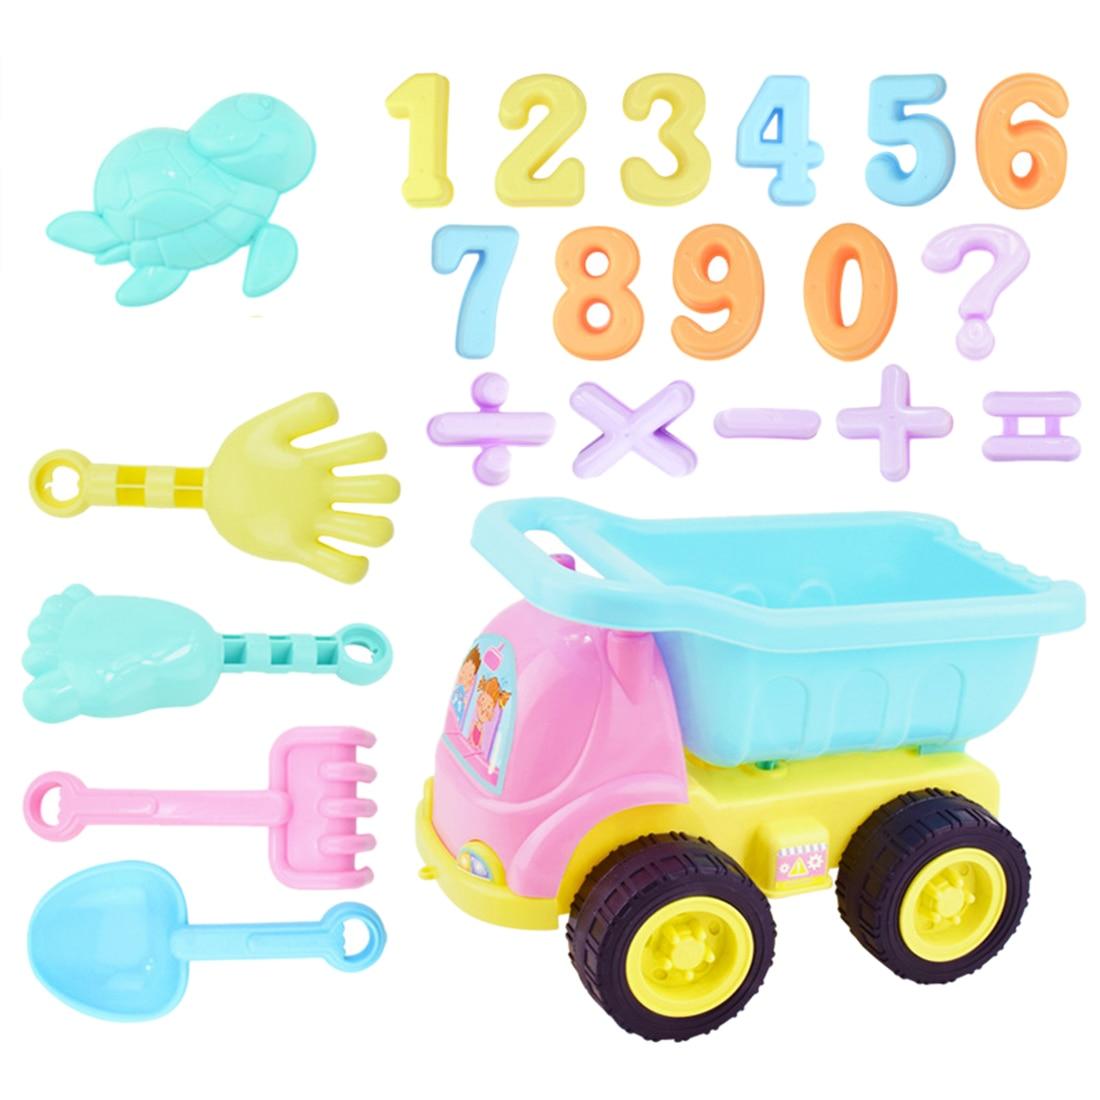 NFSTRIKE 22Pcs Children Outdoor Beach Sand Toy Dump Truck Playset Kids Beach Sand Toys Set - F Kit Medium Size